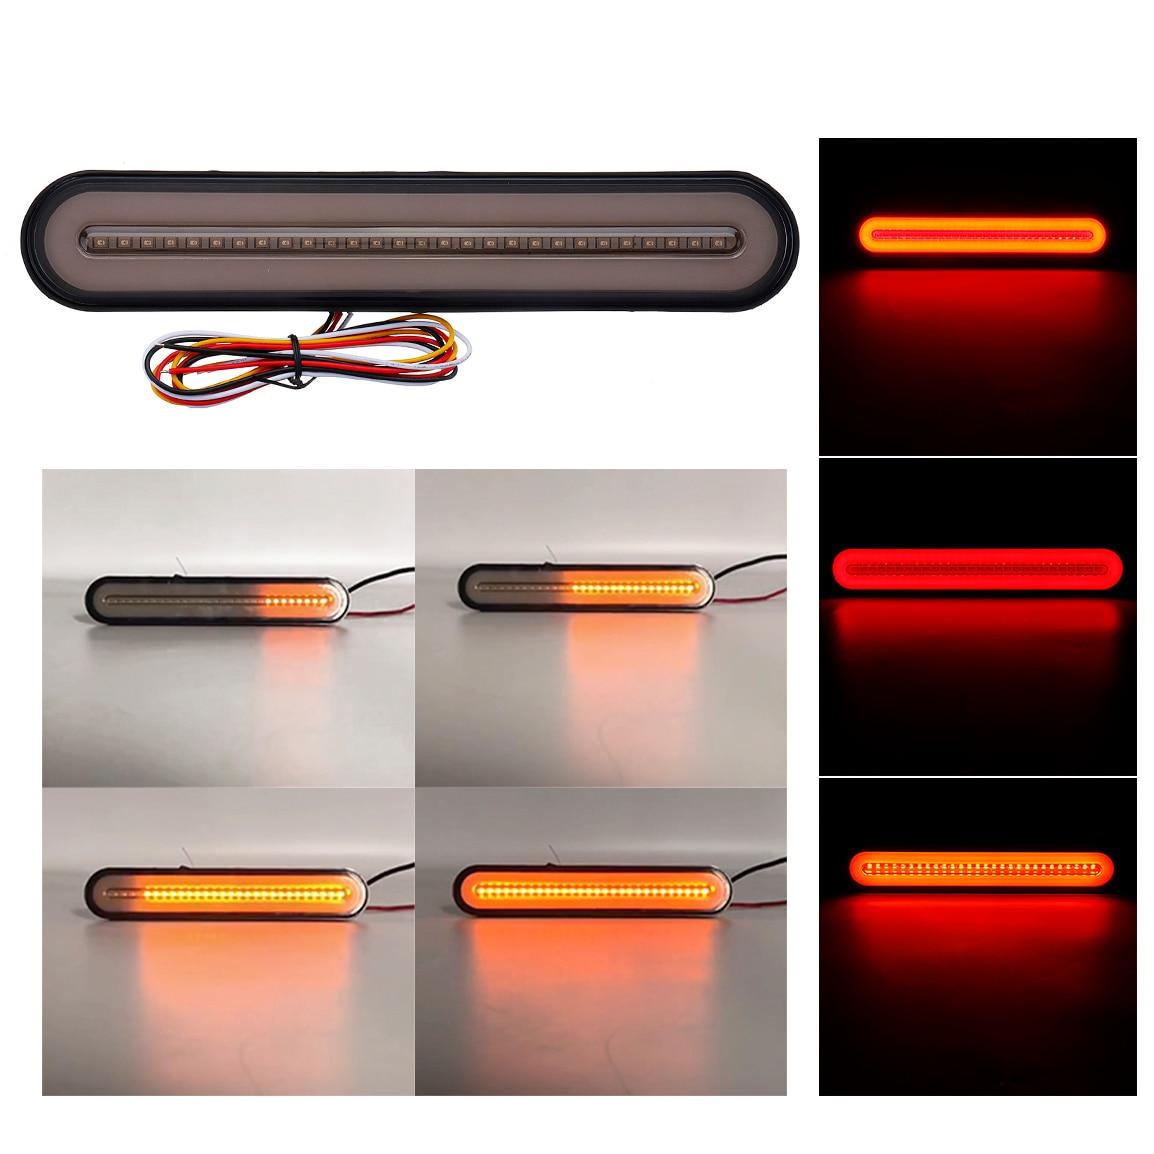 Image 2 - 1/2/4PCS 3 in 1 Neon LED Trailer Truck Brake Light Waterproof Tail Brake Stop Light Flowing Turn Signal Lamp 12 24VSignal Lamp   -